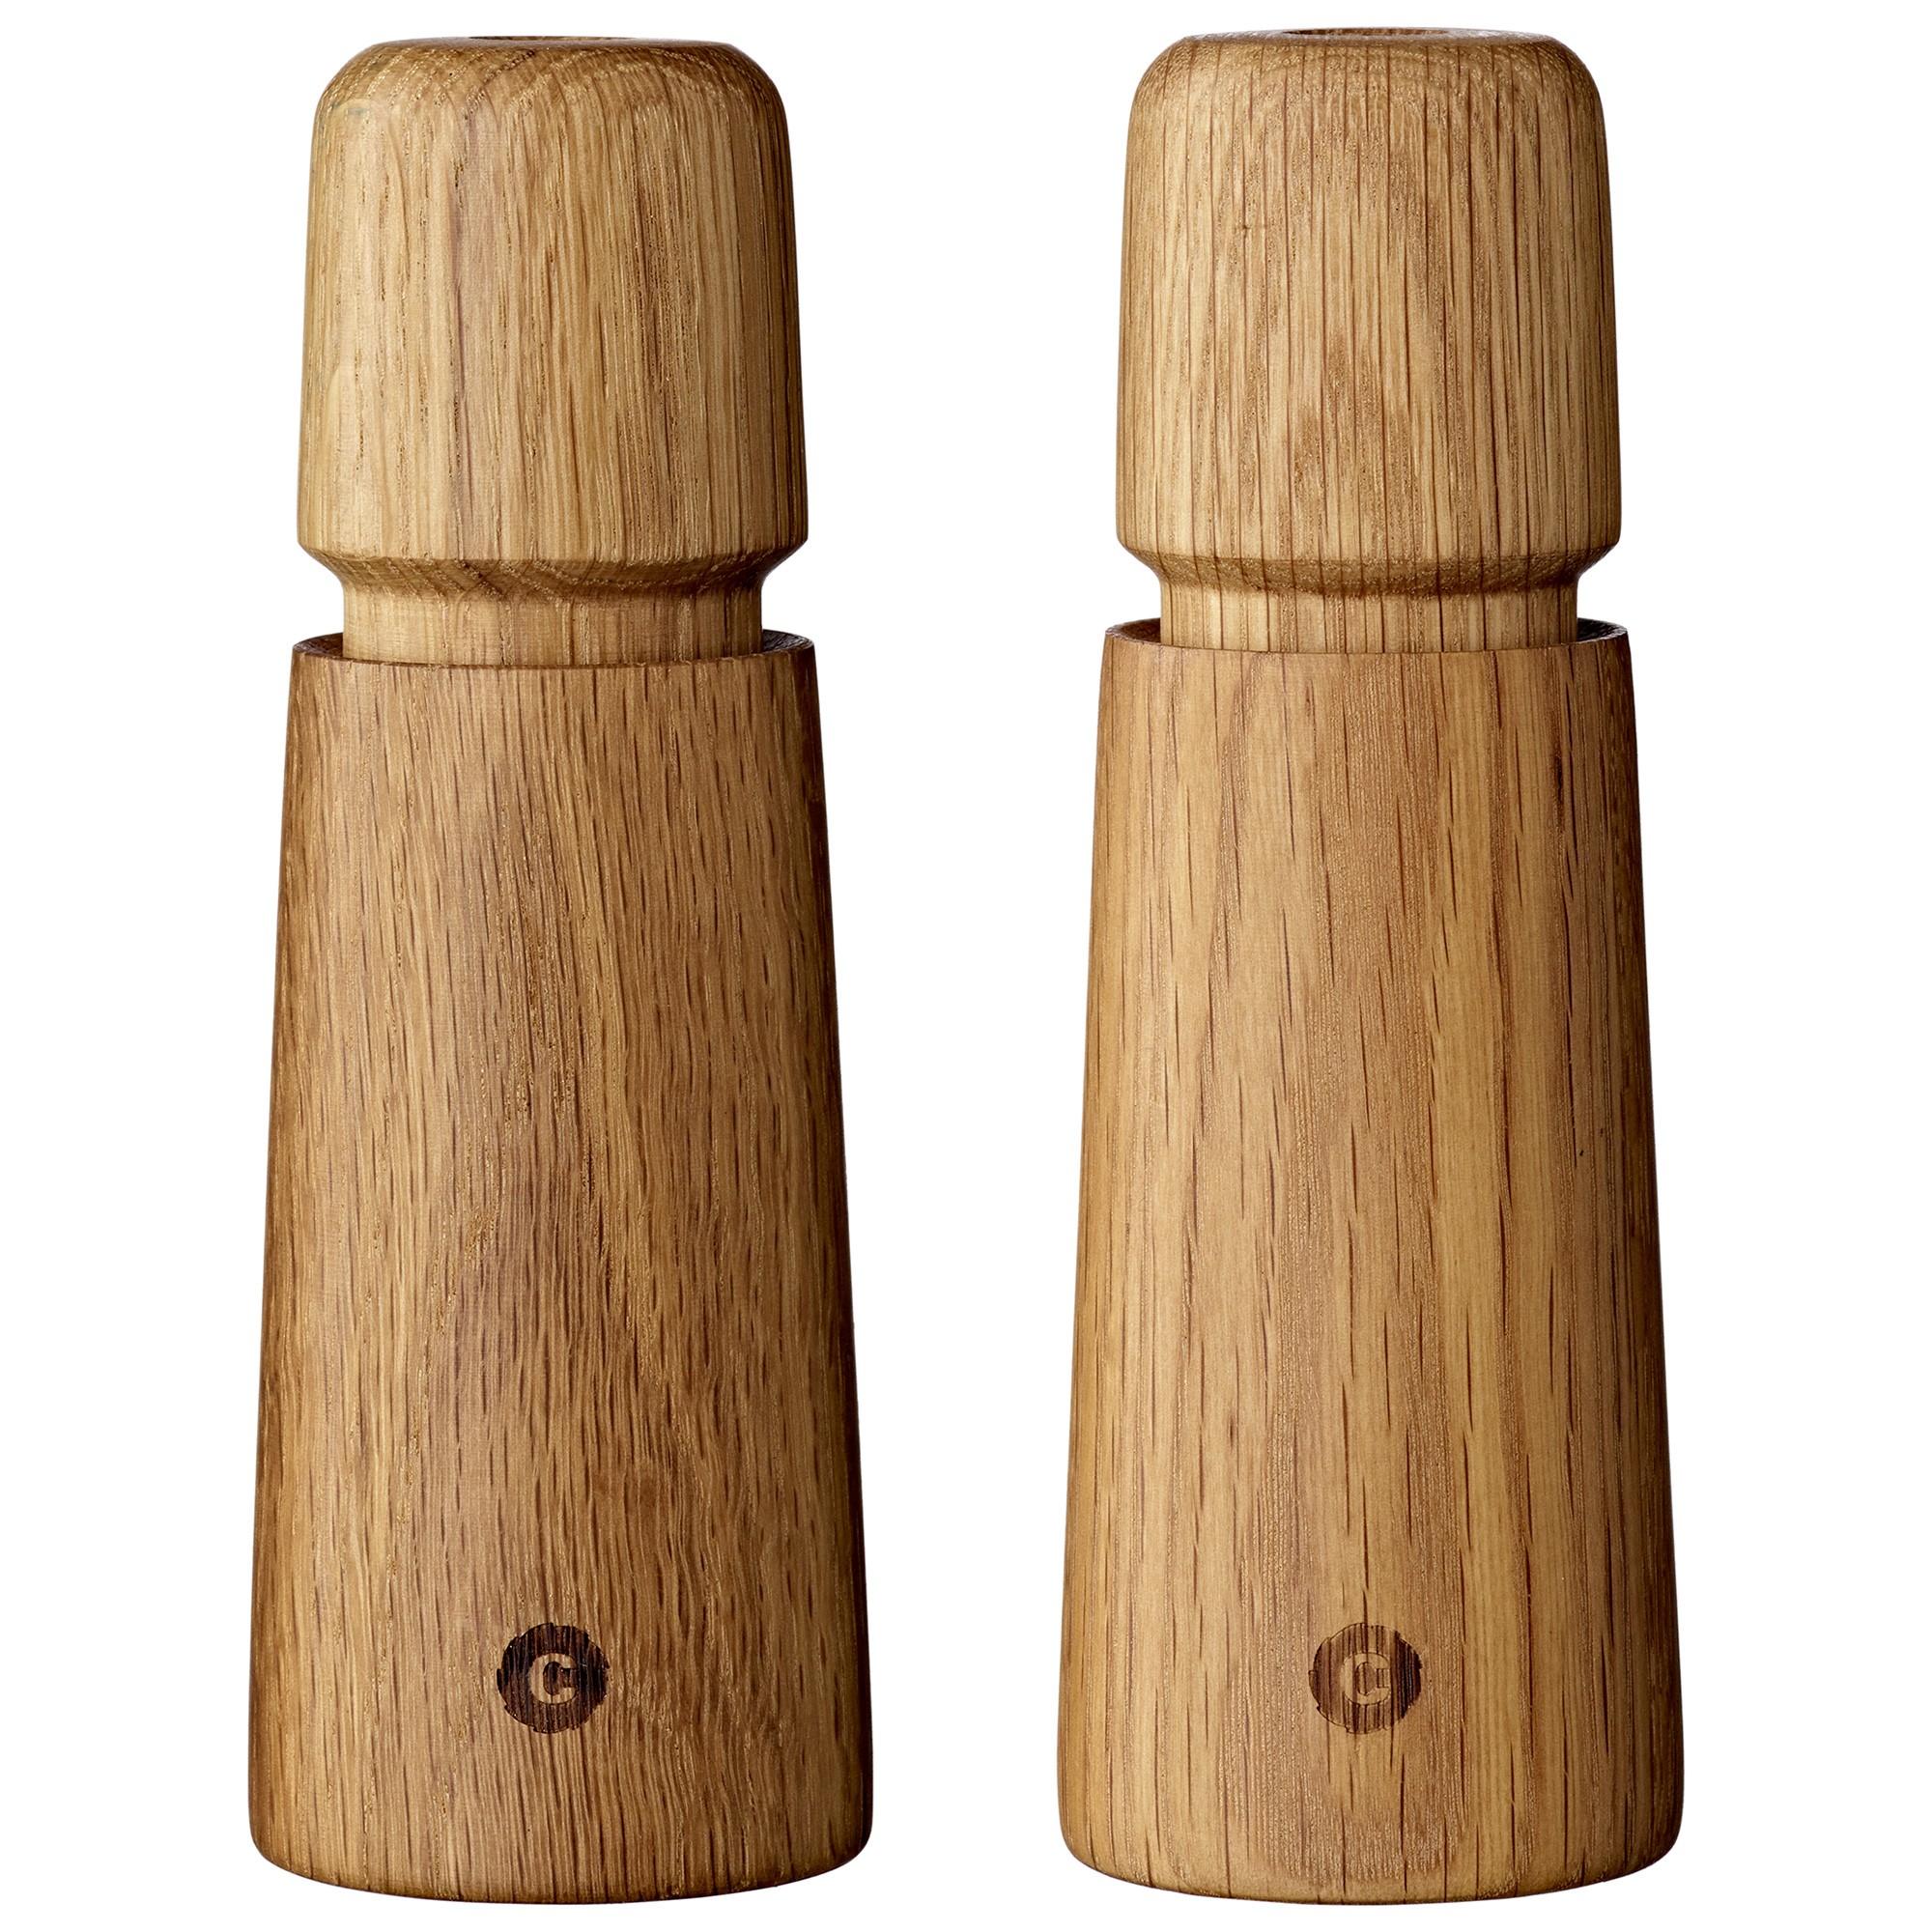 Stockholm 2 Piece Wooden Salt & Pepper Mill Set, Oak